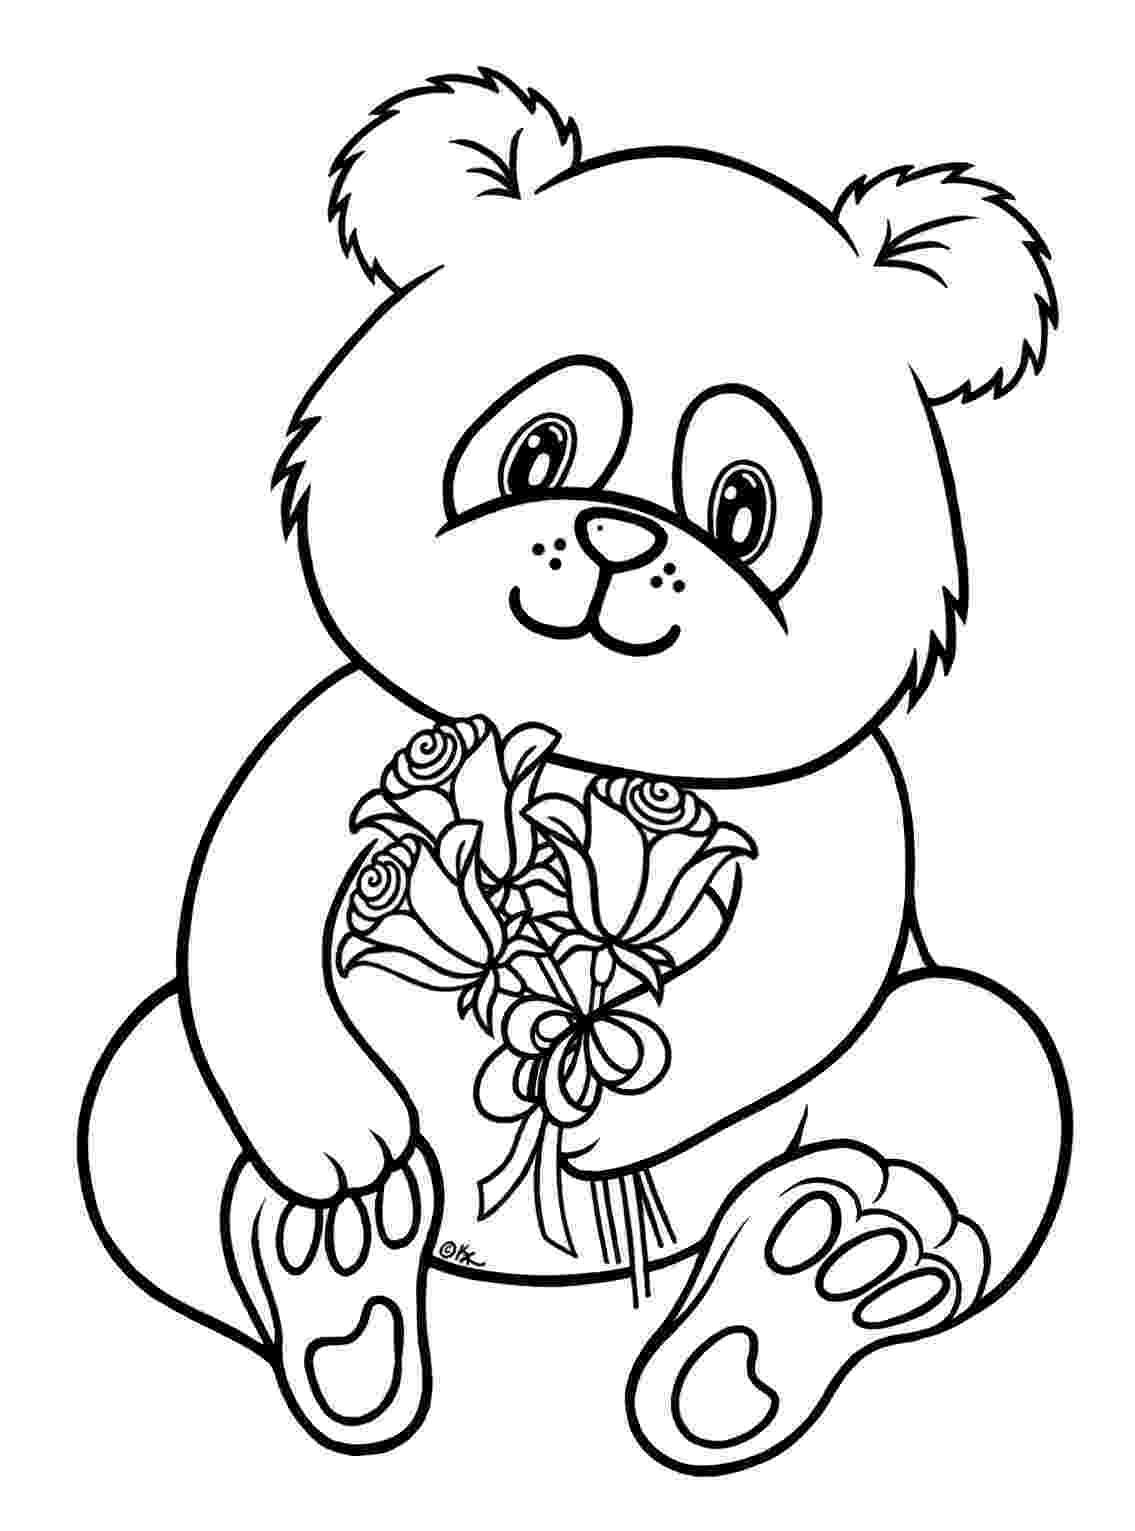 panda coloring sheets free printable panda coloring pages for kids cool2bkids coloring panda sheets